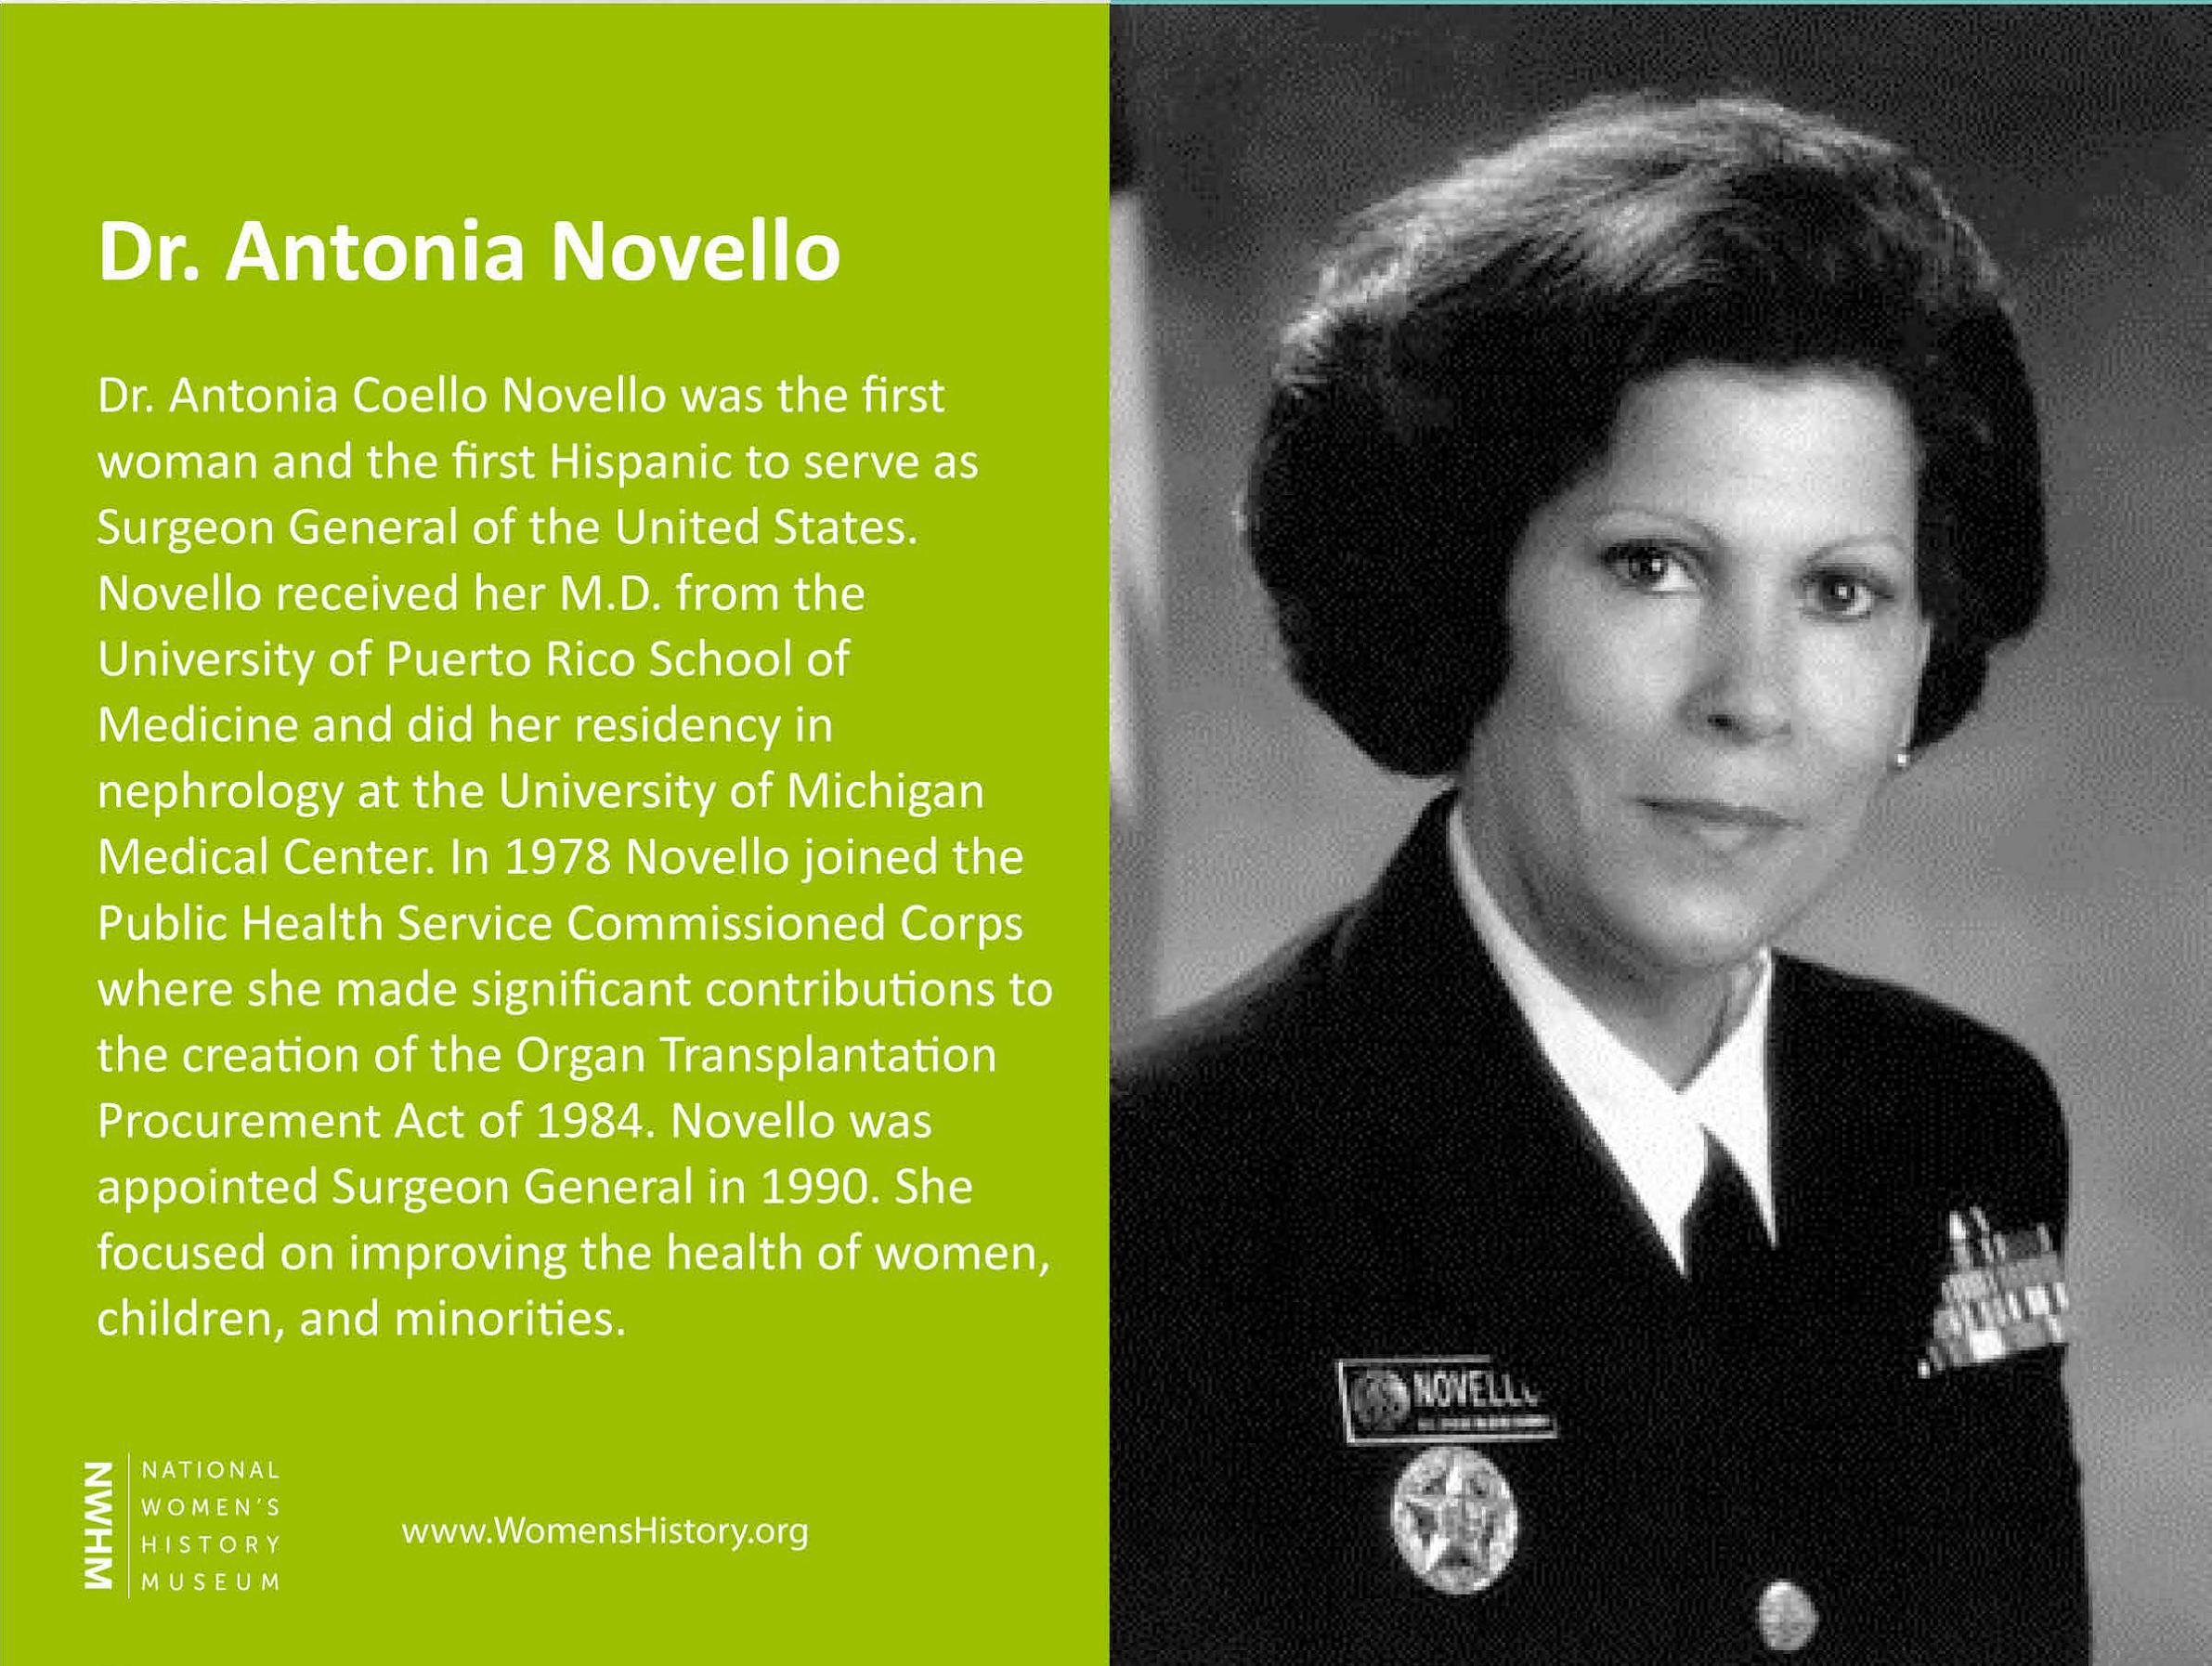 Dr. Antonia Novello